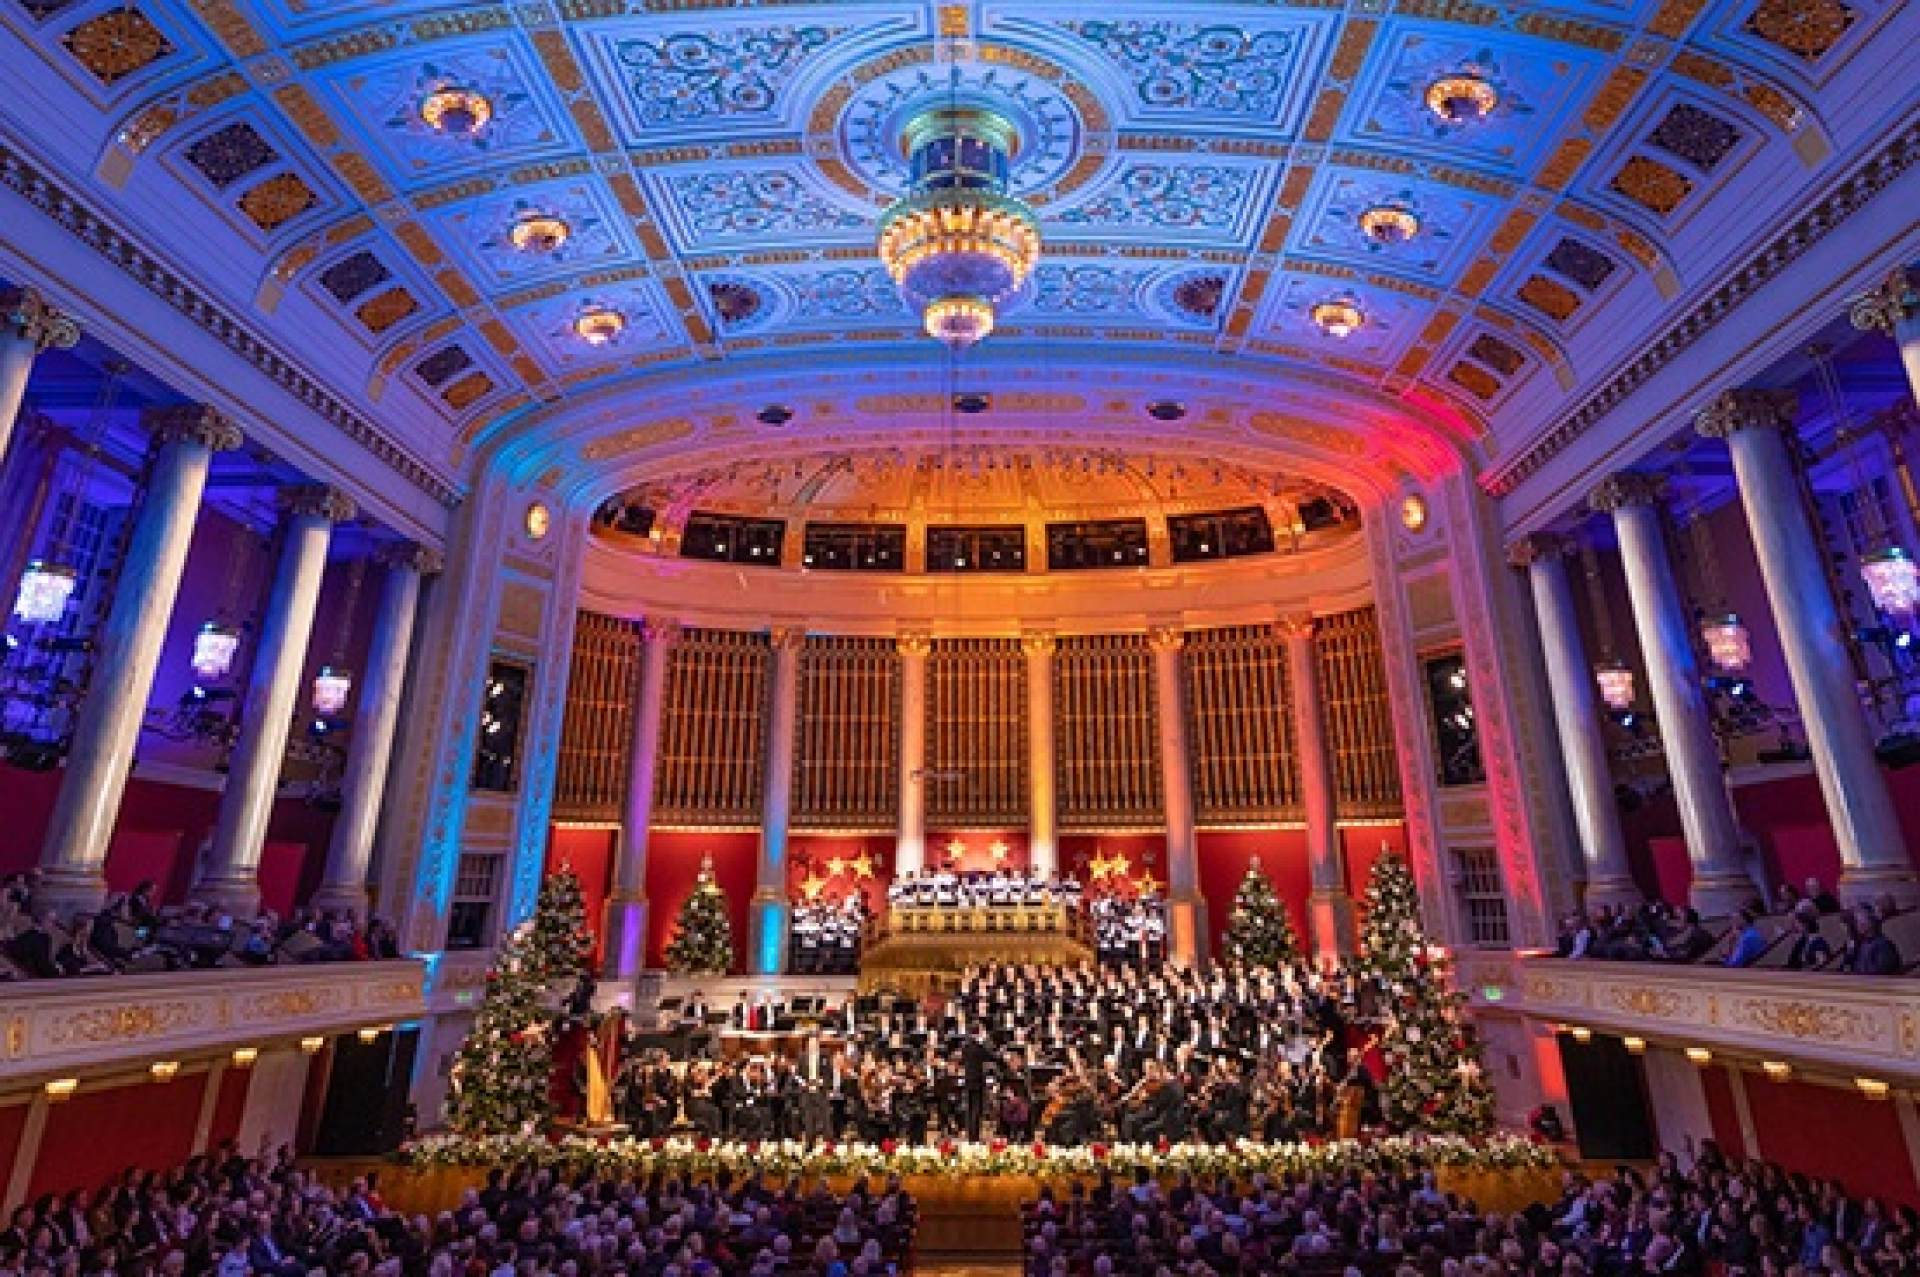 https://www.vienna-concert.com/imagini-w/1920/31050Christmas-in-Vienna-%E2%80%93-Gala.jpg